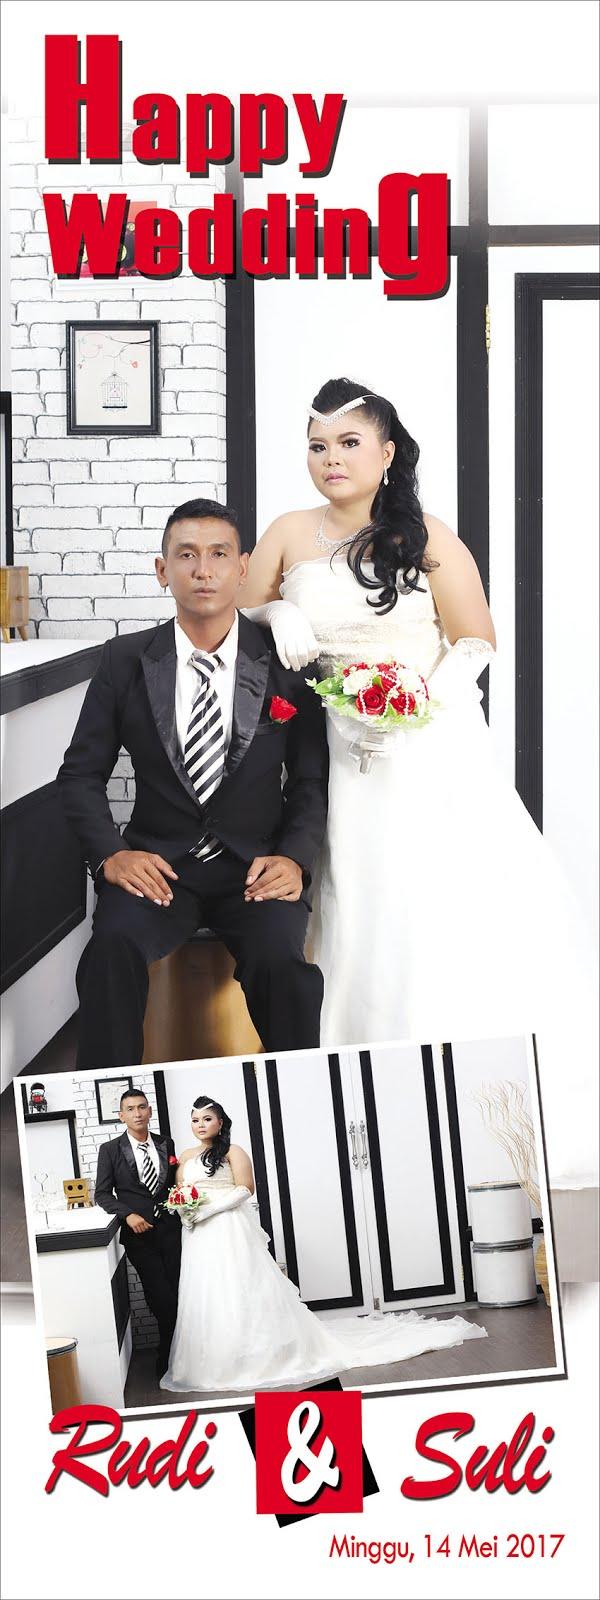 Design x banner pernikahan - Desain X Banner Wedding Bag 1